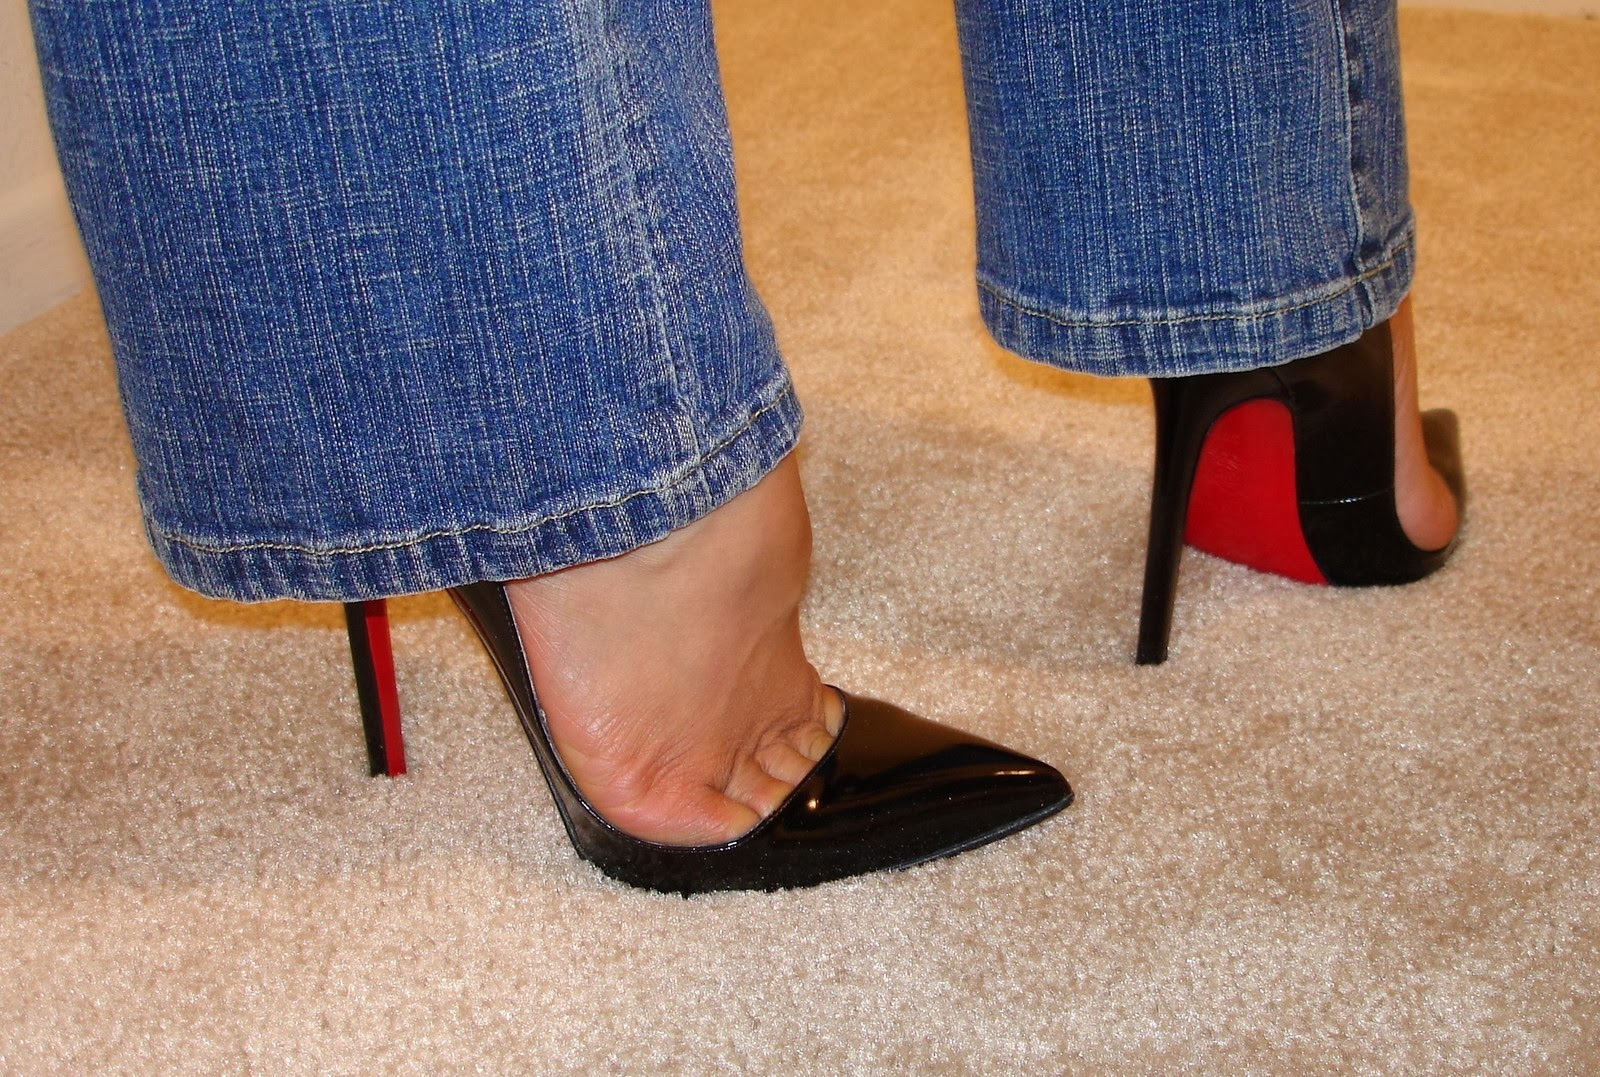 The Toe Cleavage Blog: More EBay stuff